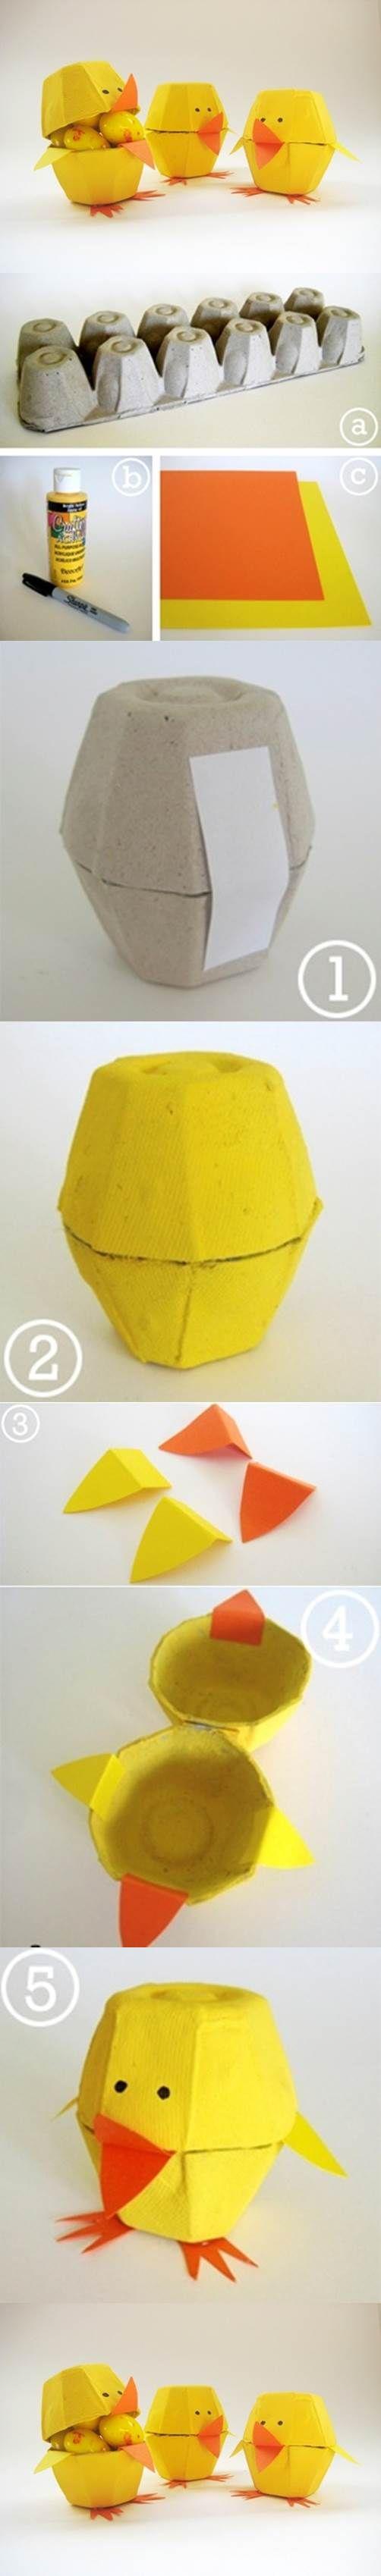 Egg Carton Craft – Lovely Chicks | iCreativeIdeas.com Like Us on Facebook == www.facebook.com/…